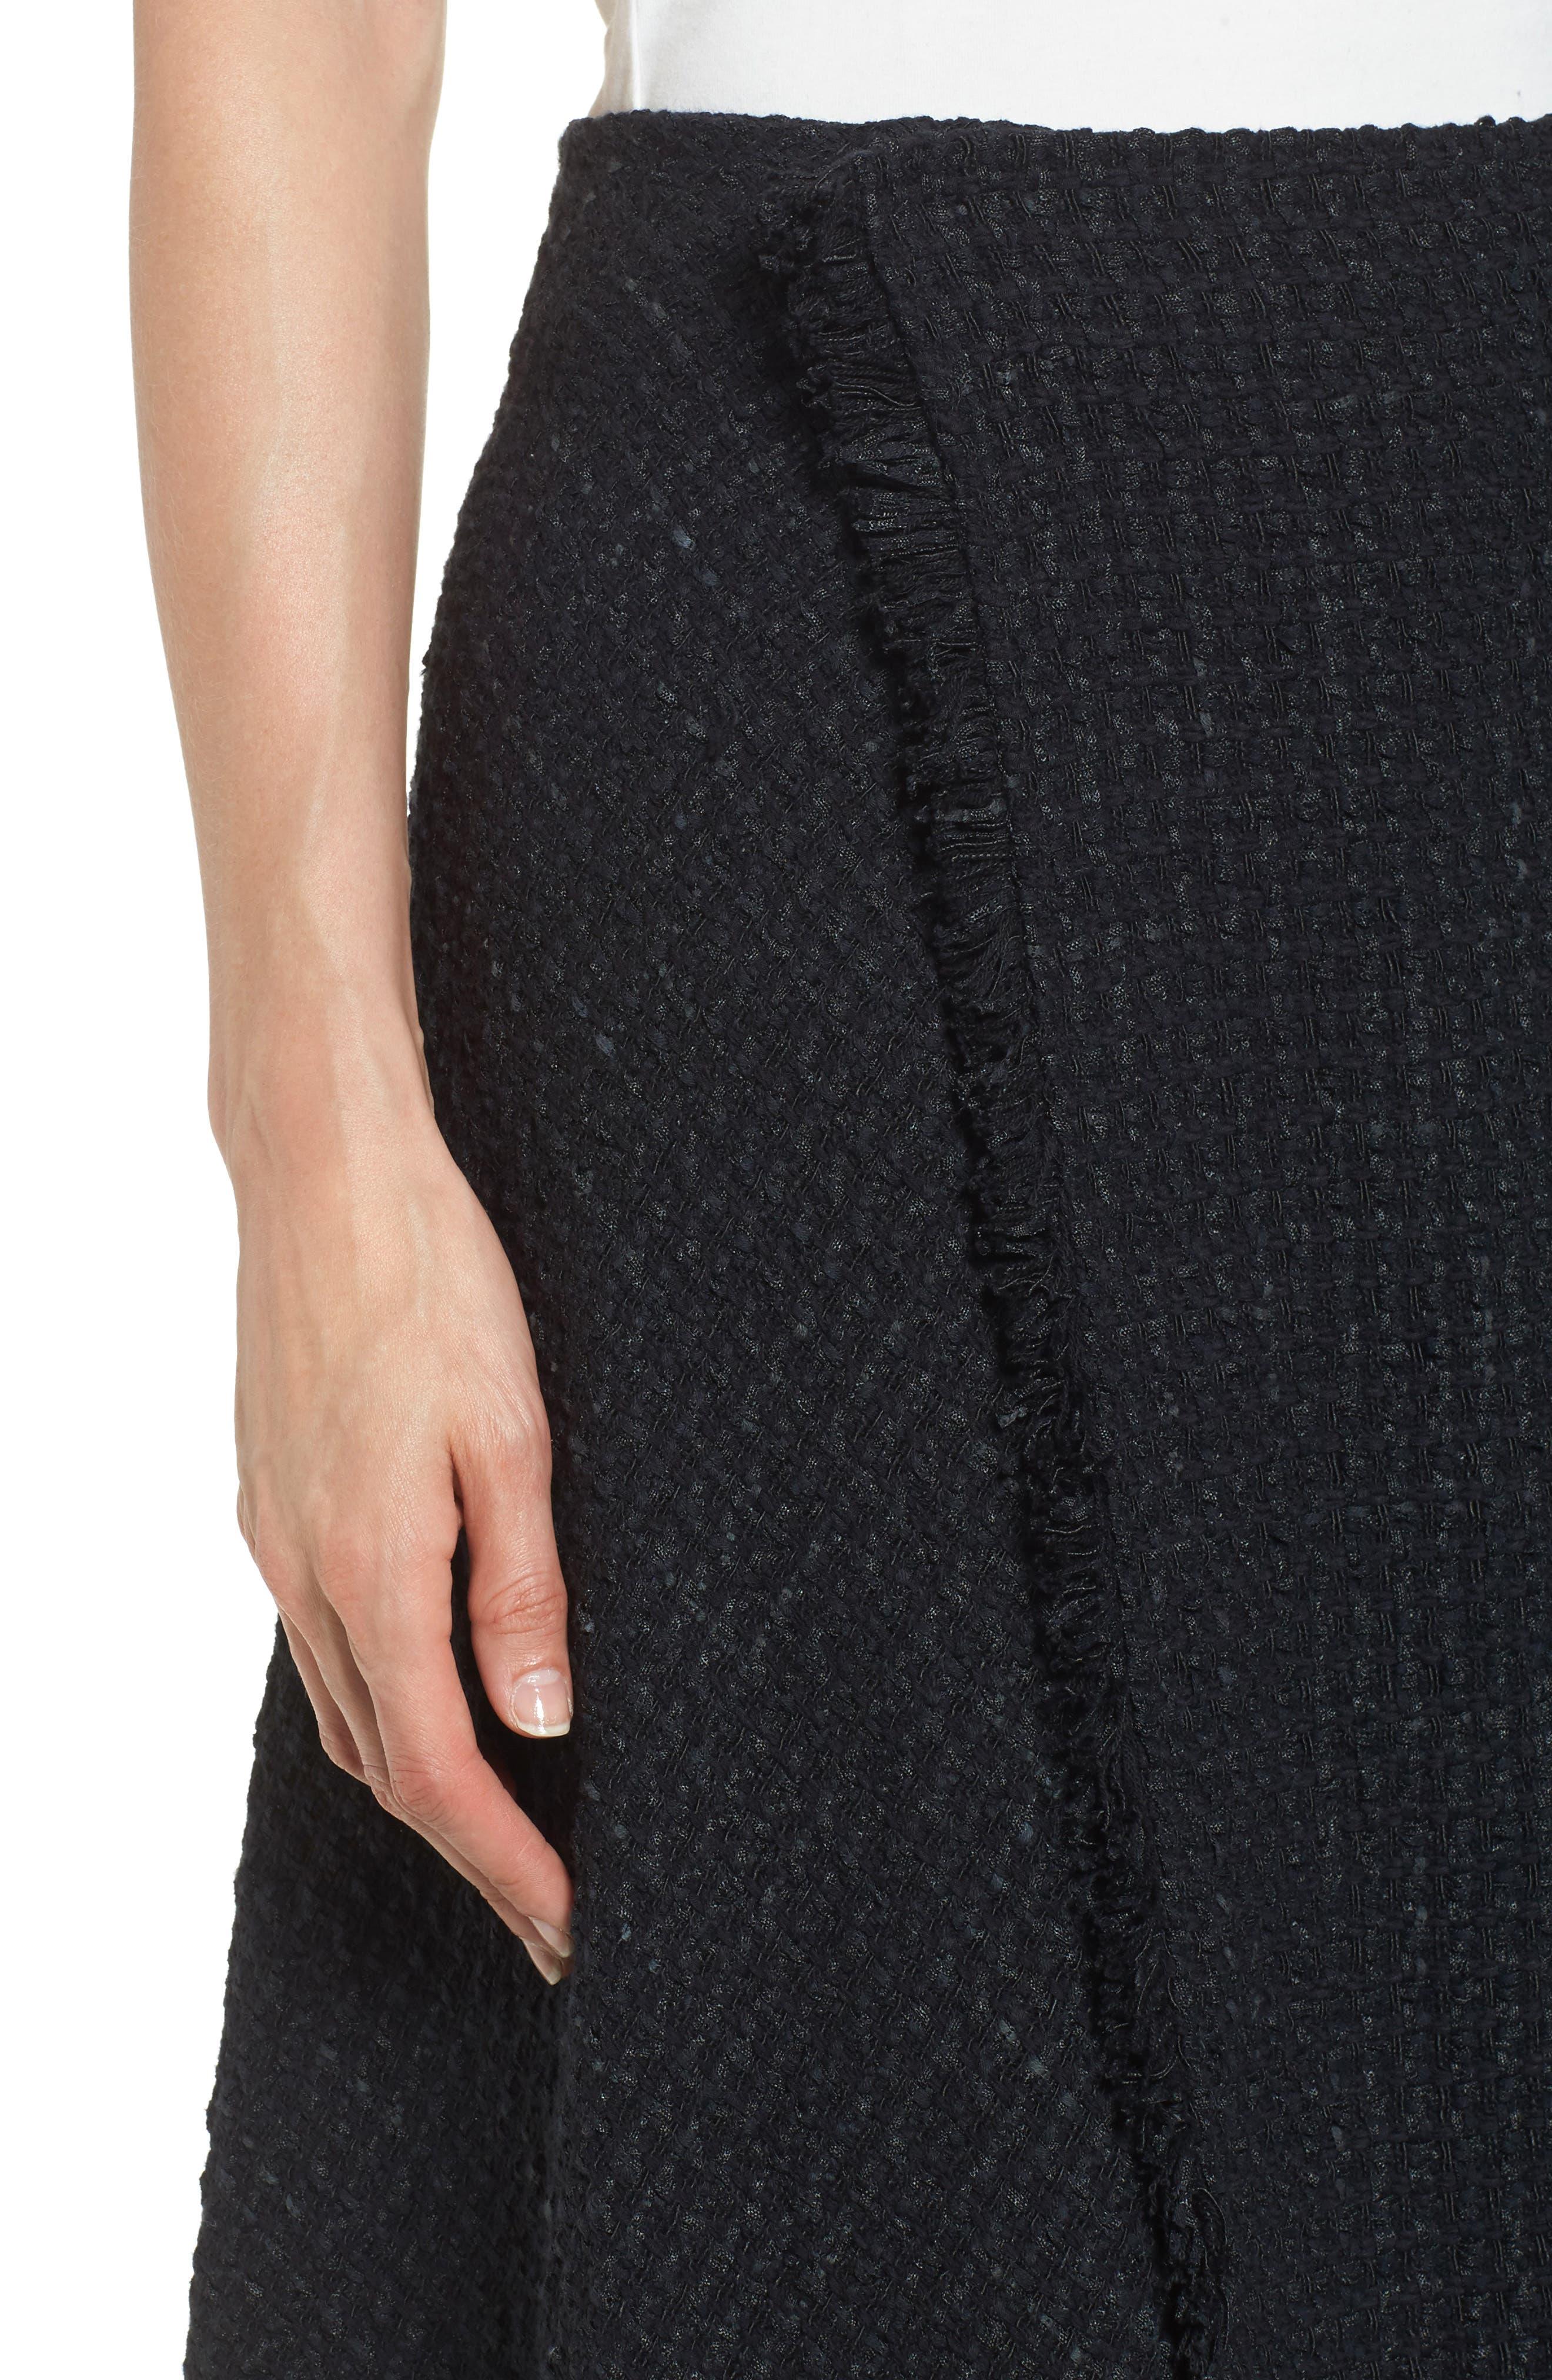 NIC + ZOE Majestic Tweed Skirt,                             Alternate thumbnail 4, color,                             004